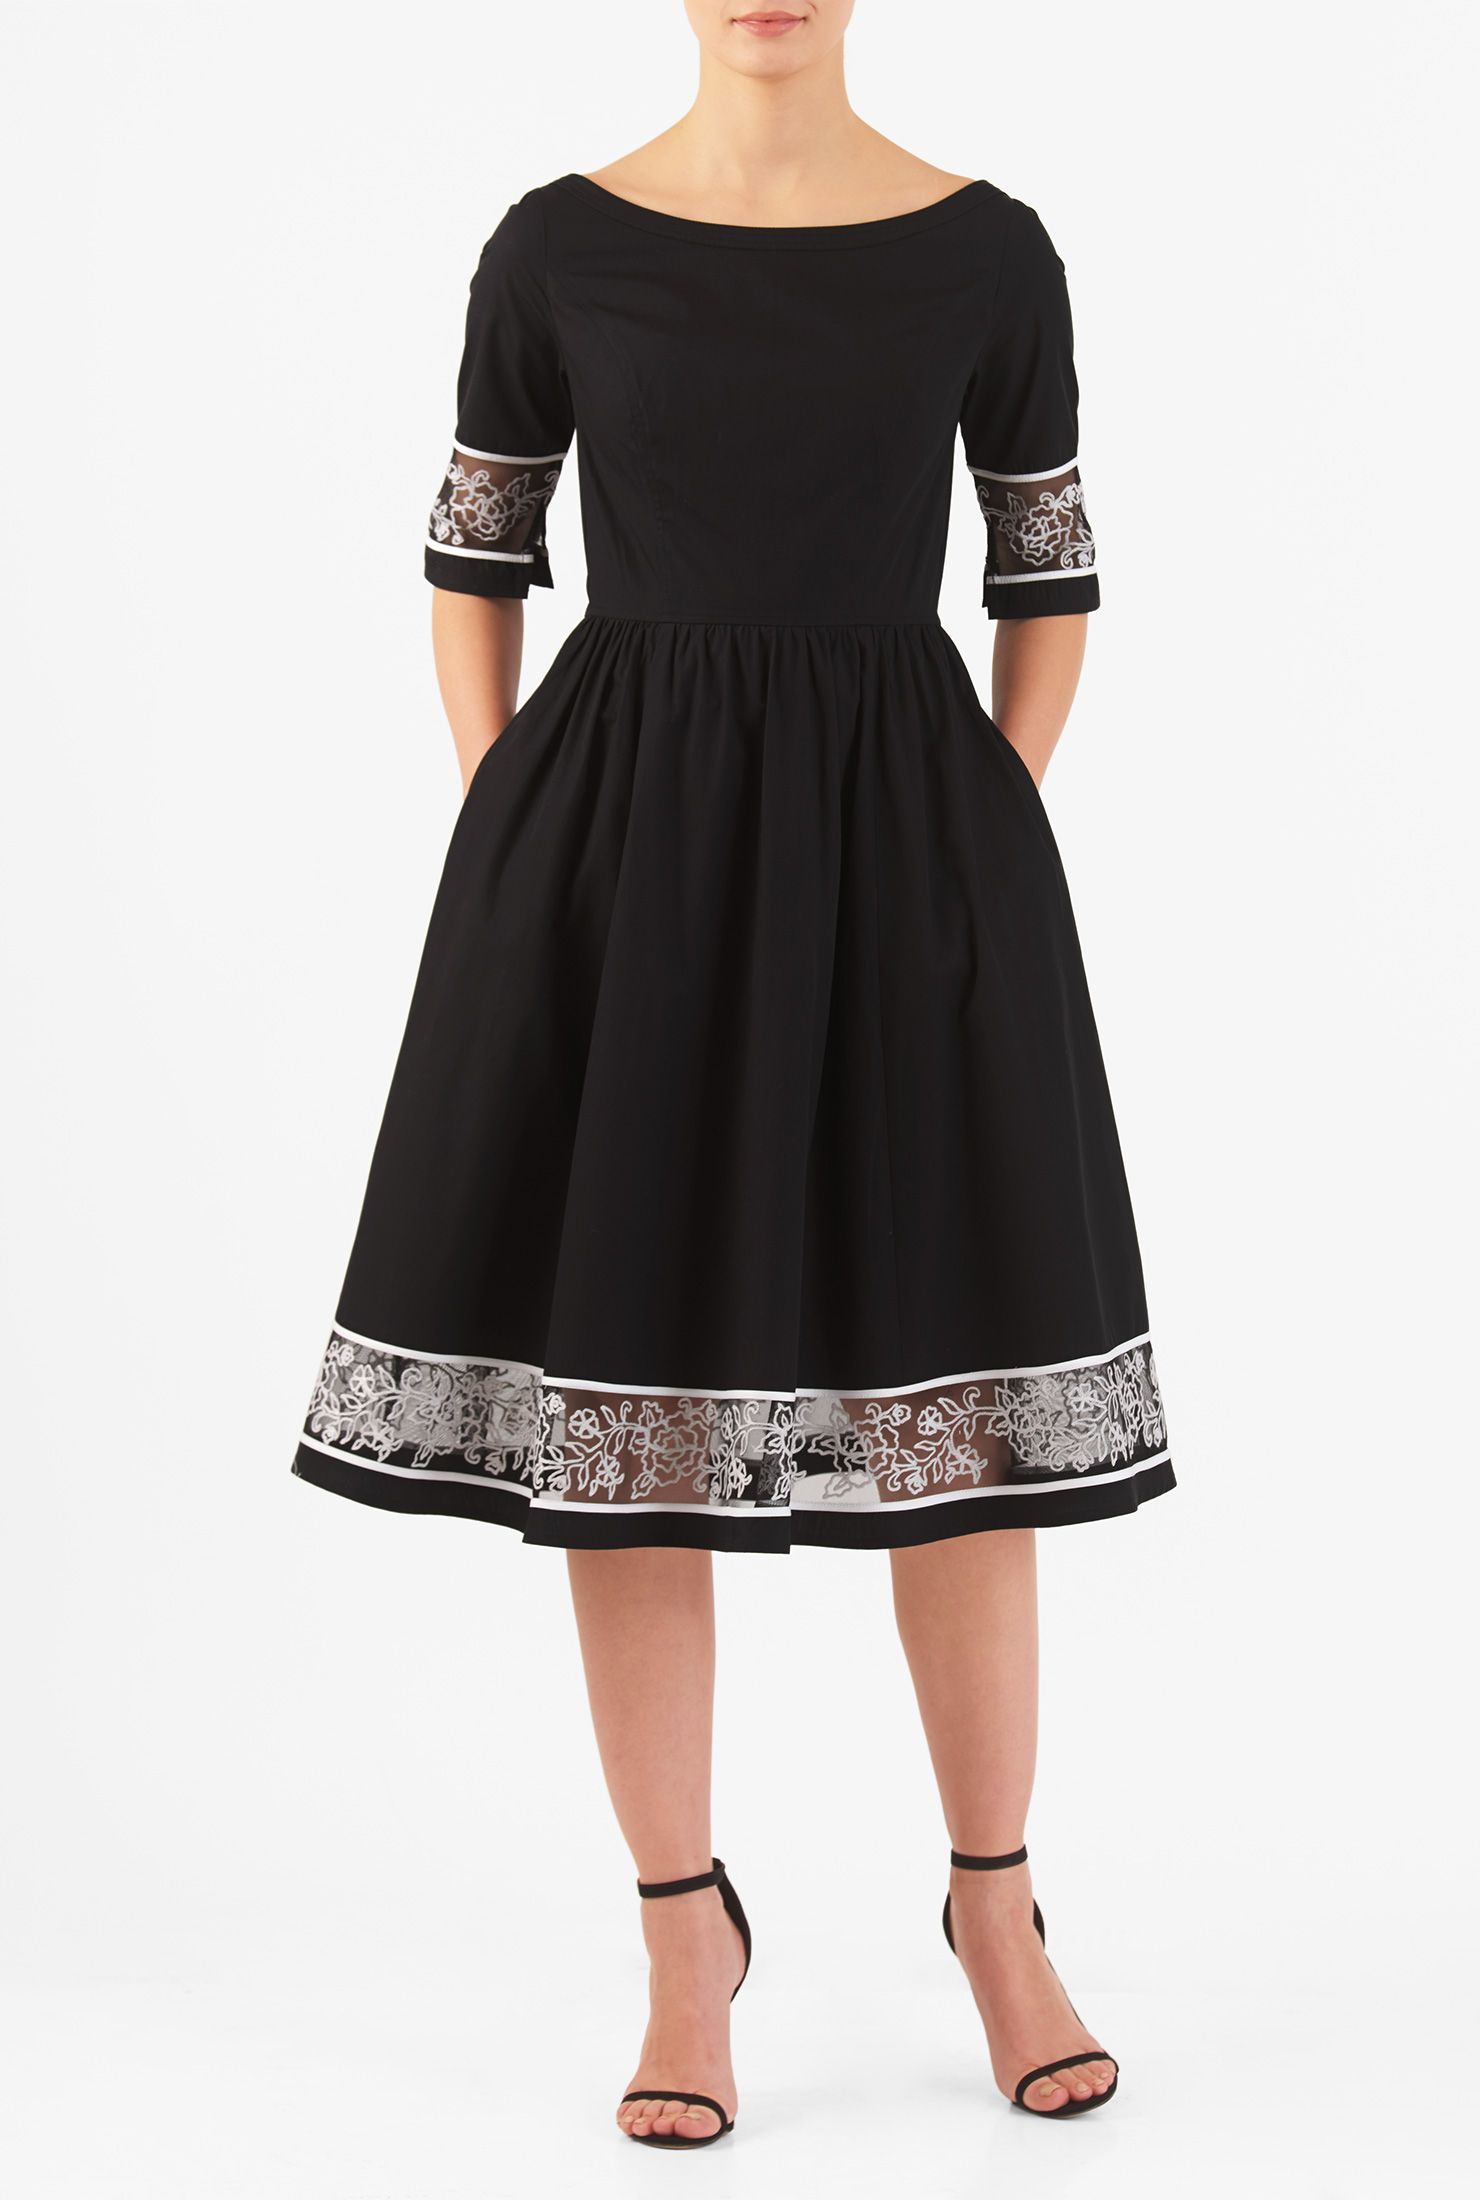 Women's Fashion Clothing 20 20W and Custom   Poplin dress, Cotton ...